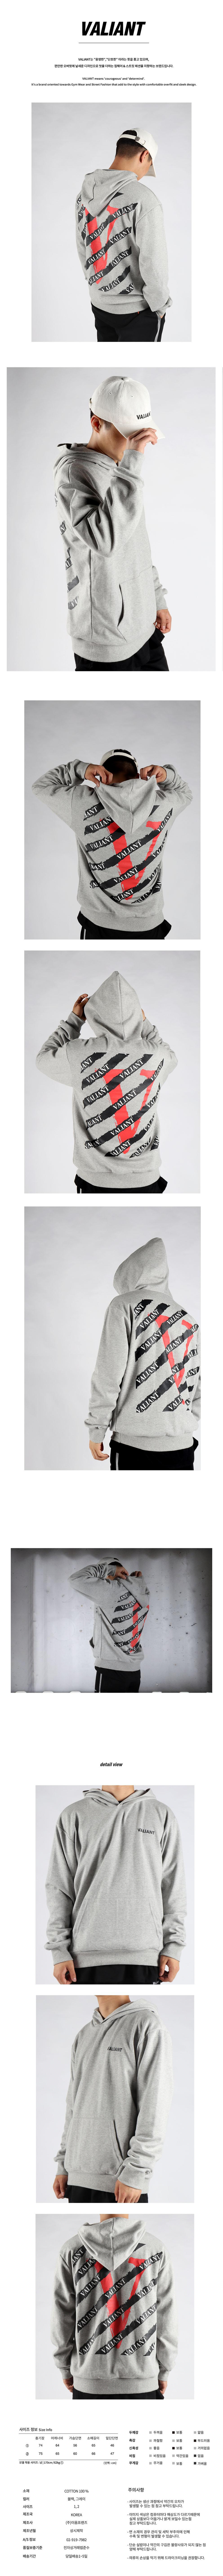 crewbi scratch hoodieLIGHT GRAY.jpg